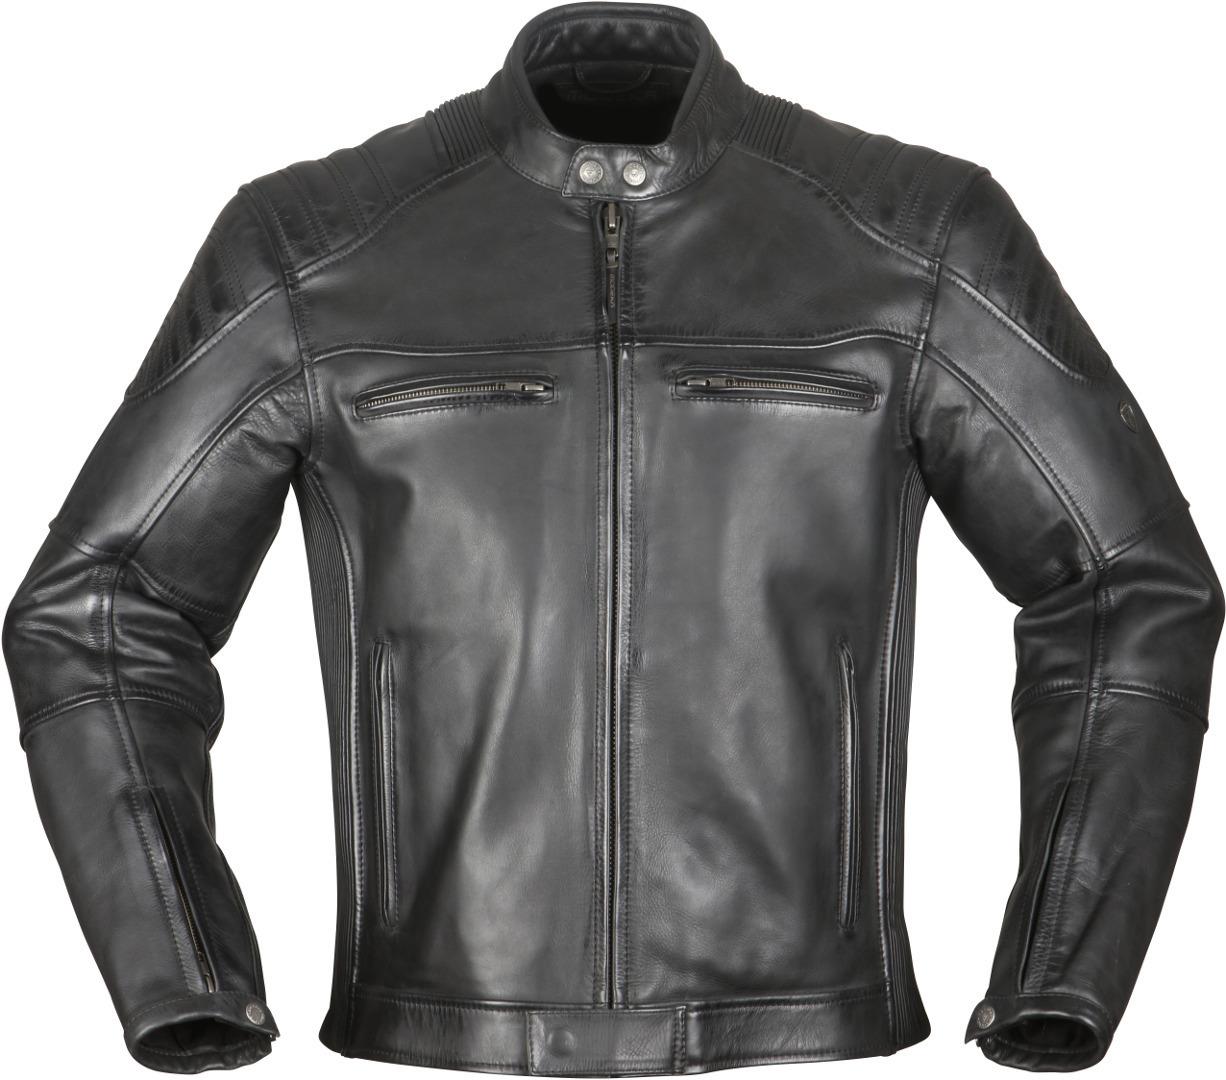 Modeka Vincent Motorcycle Leather Jacket